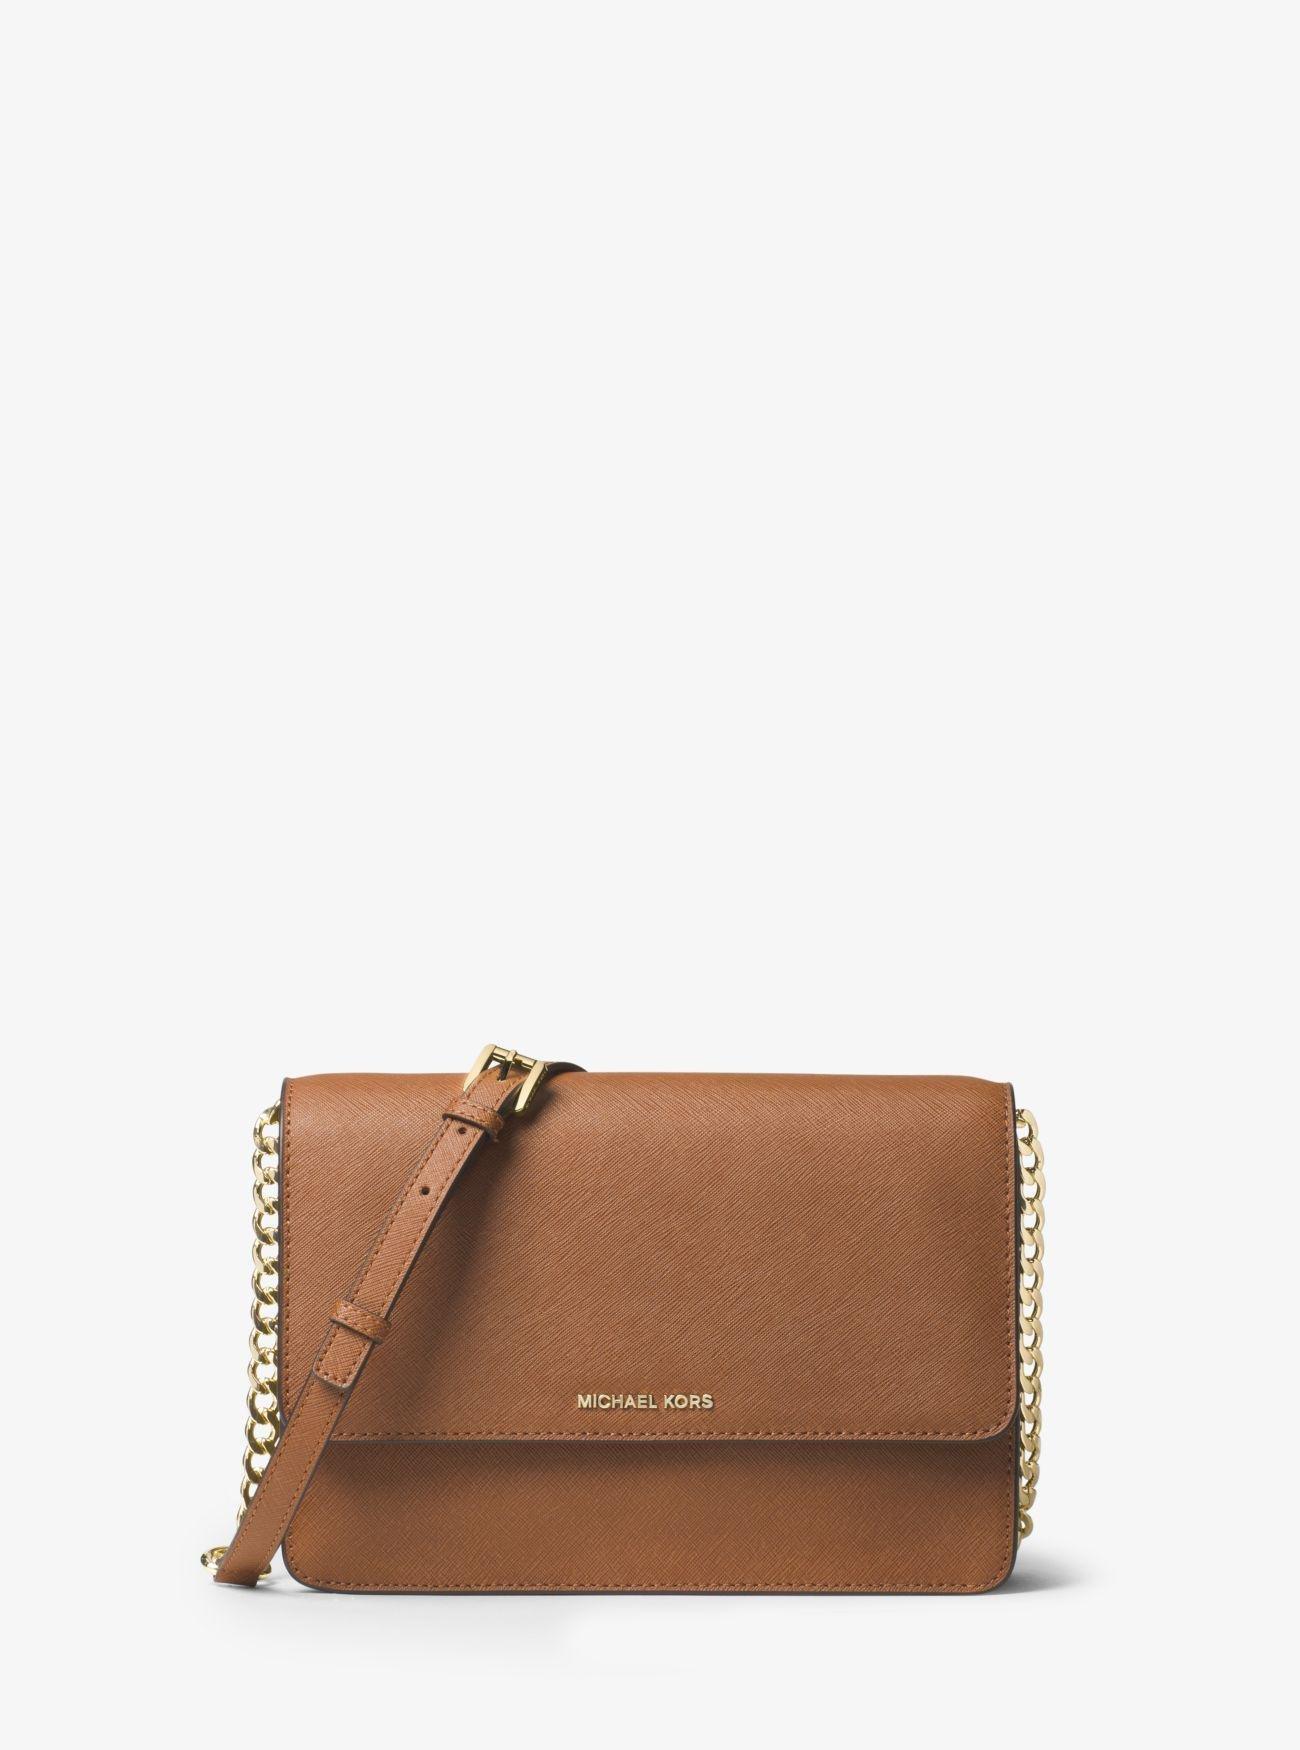 0eb9f070b567 Lyst - Michael Kors Daniela Large Leather Crossbody in Brown